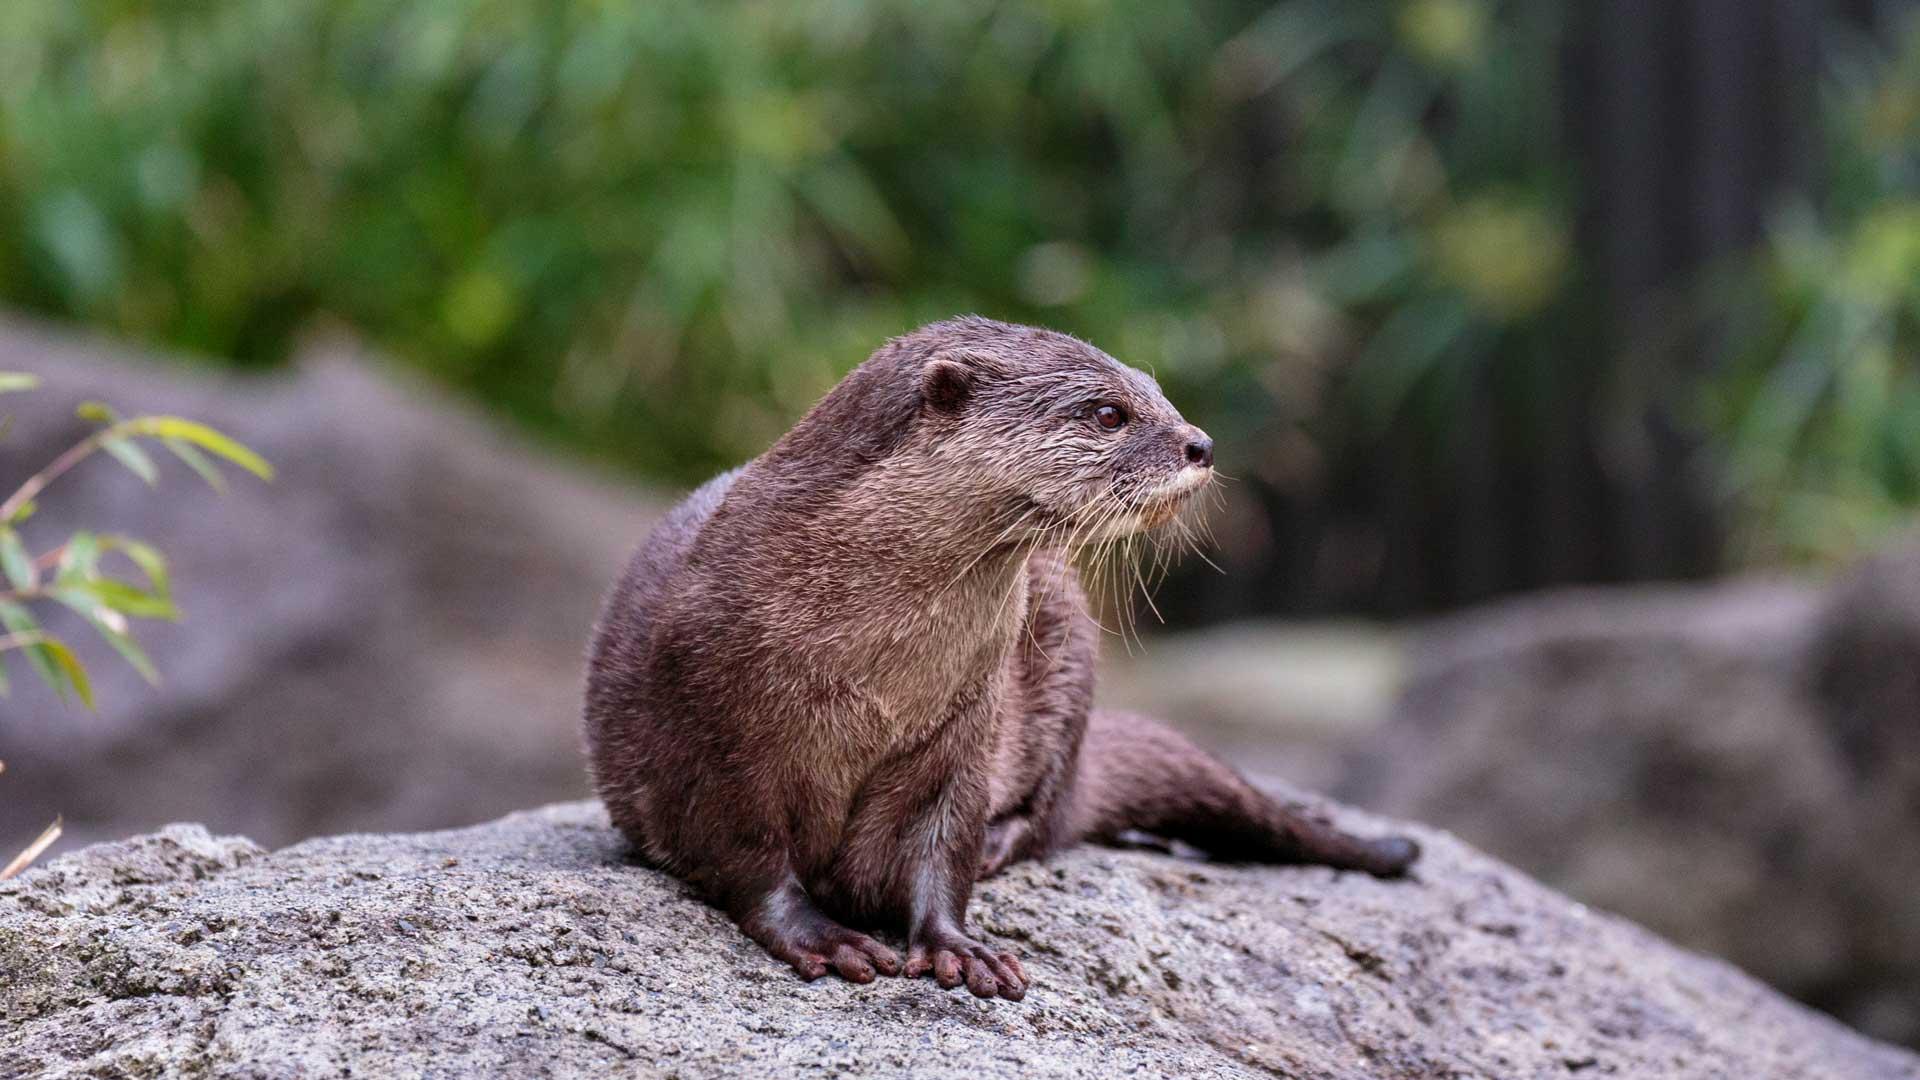 https://rfacdn.nz/zoo/assets/media/otter-gallery-4.jpg